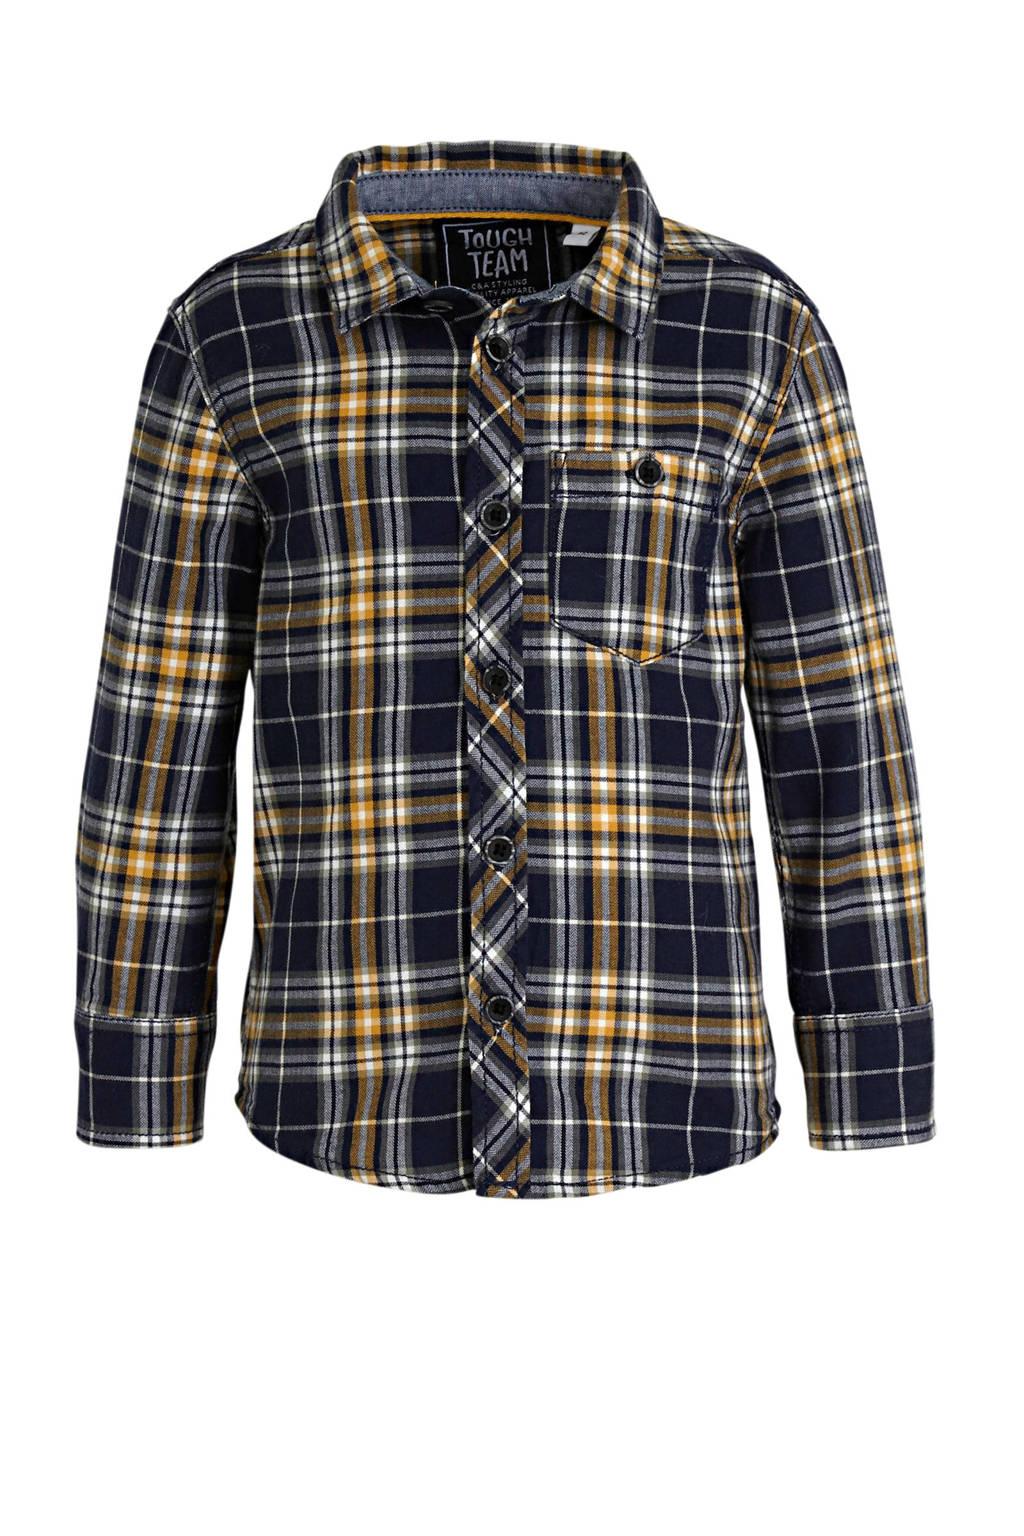 C&A geruit overhemd donkerblauw/geel, Donkerblauw/geel